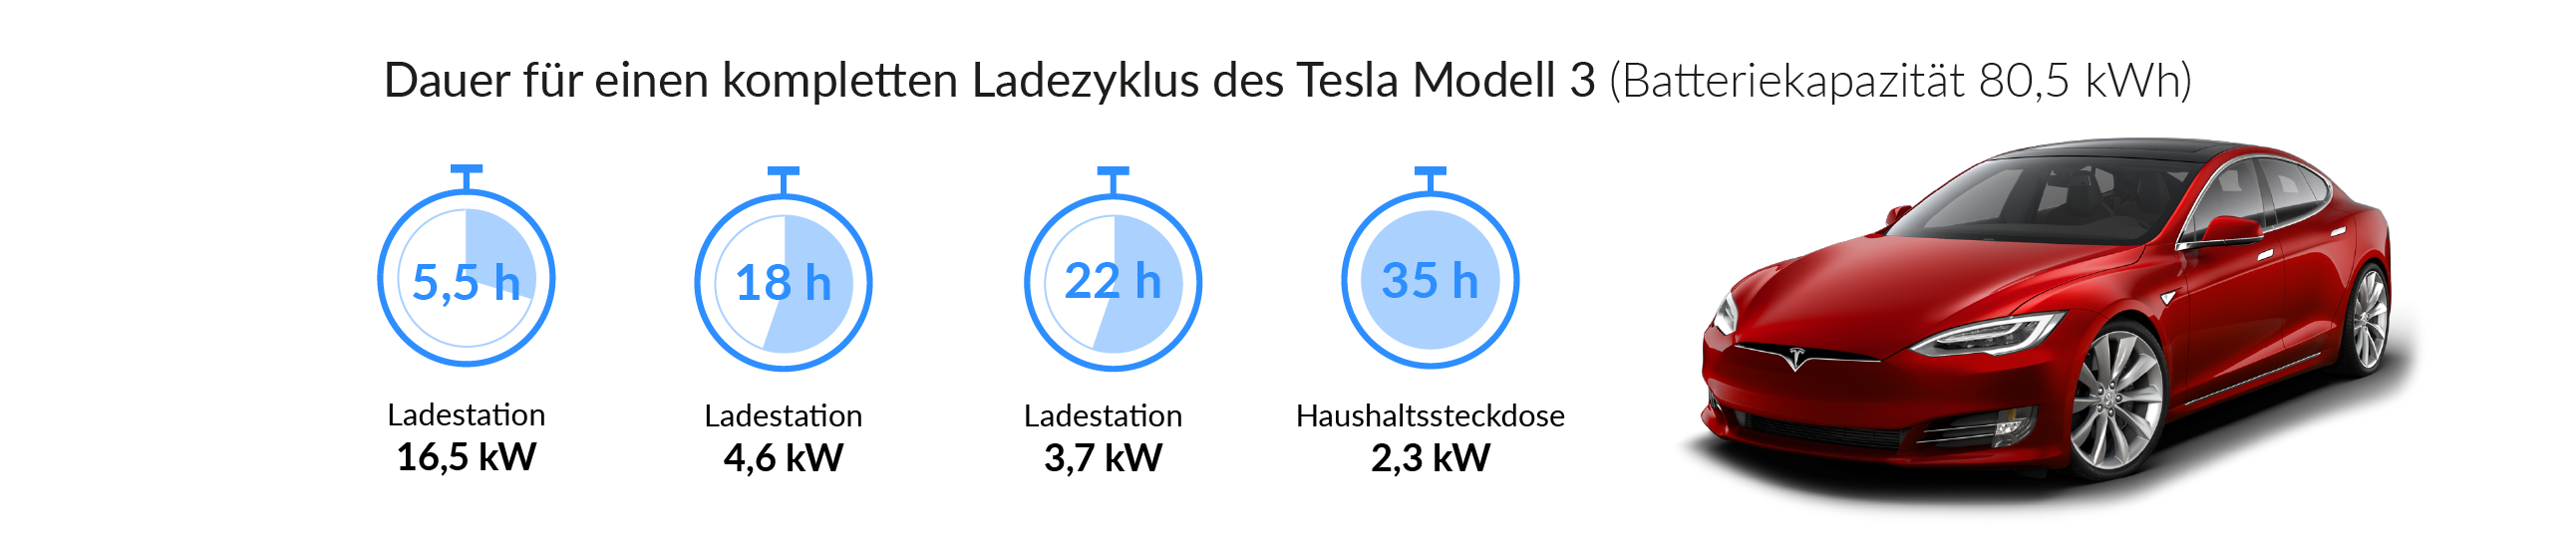 Ladezeiten des Tesla Model 3